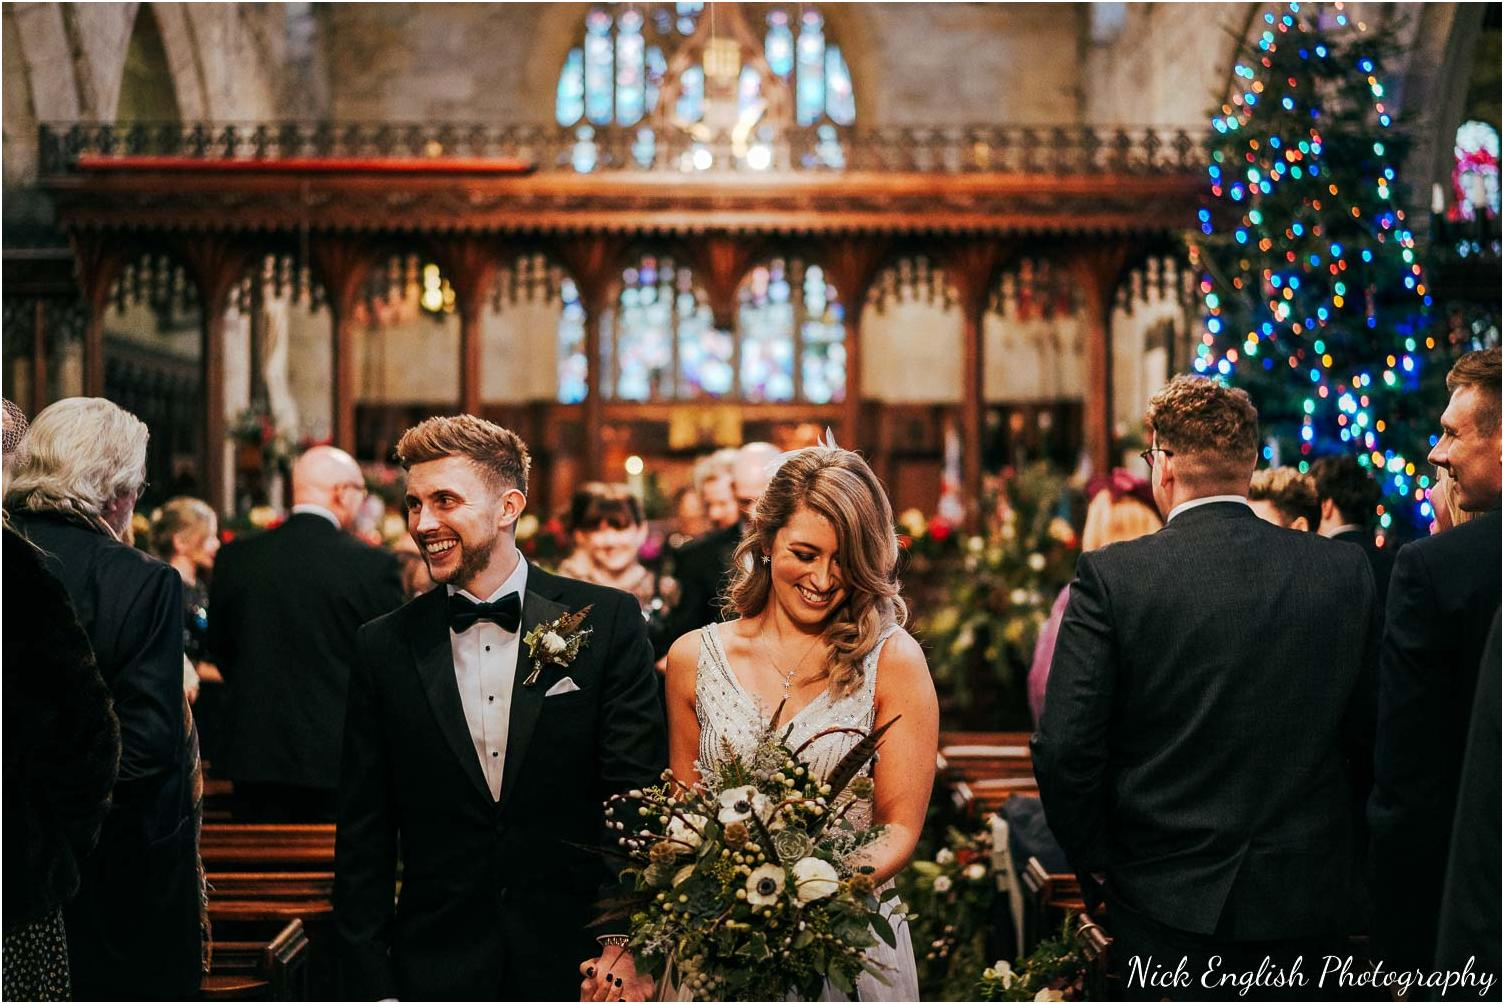 Mitton_Hall_Christmas_Winter_Wedding-34.jpg